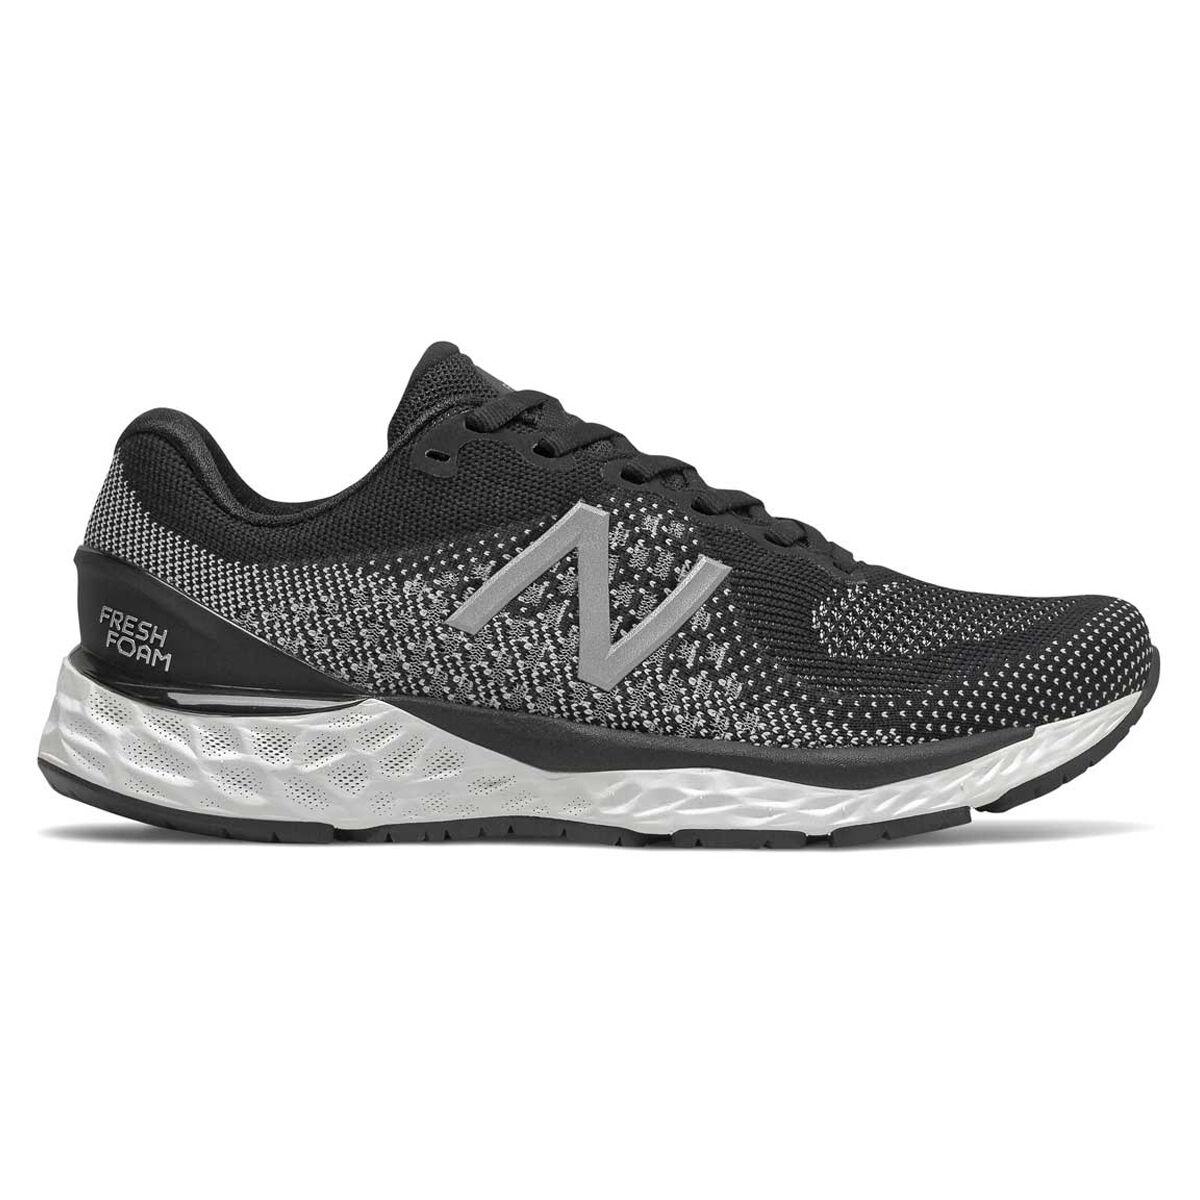 New Balance 880v10 D Womens Running